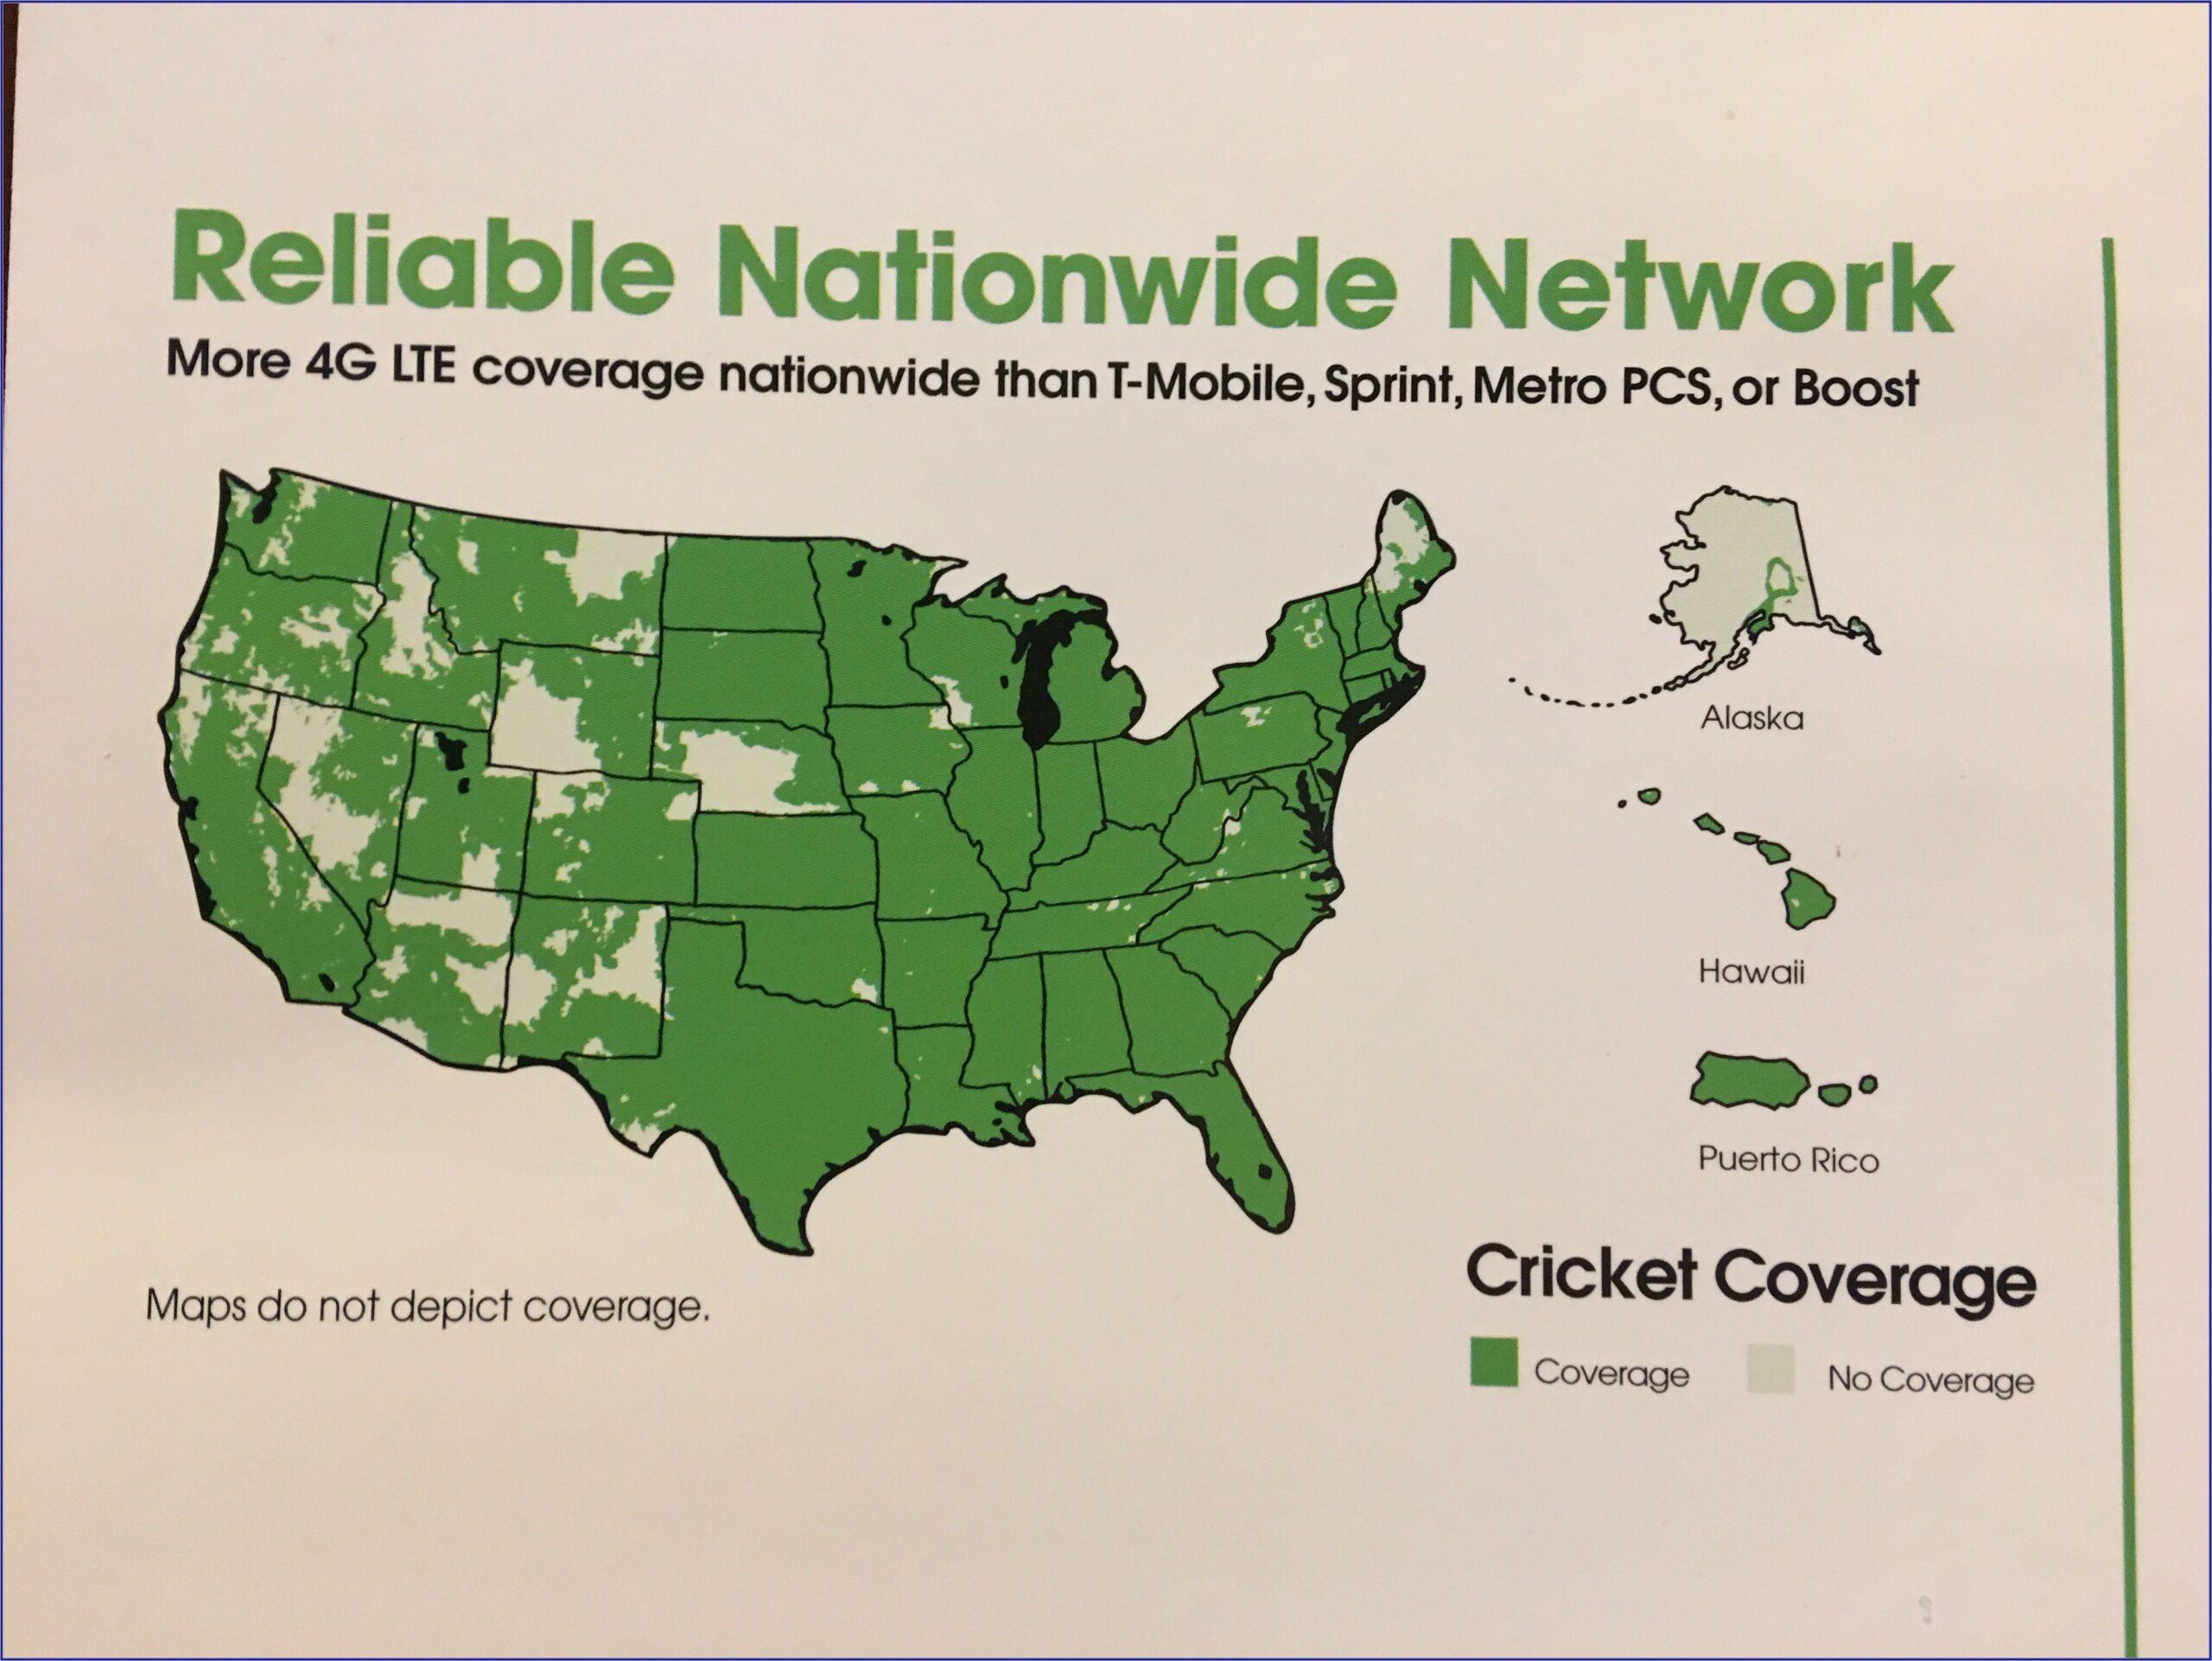 Metropcs World Calling Coverage Map